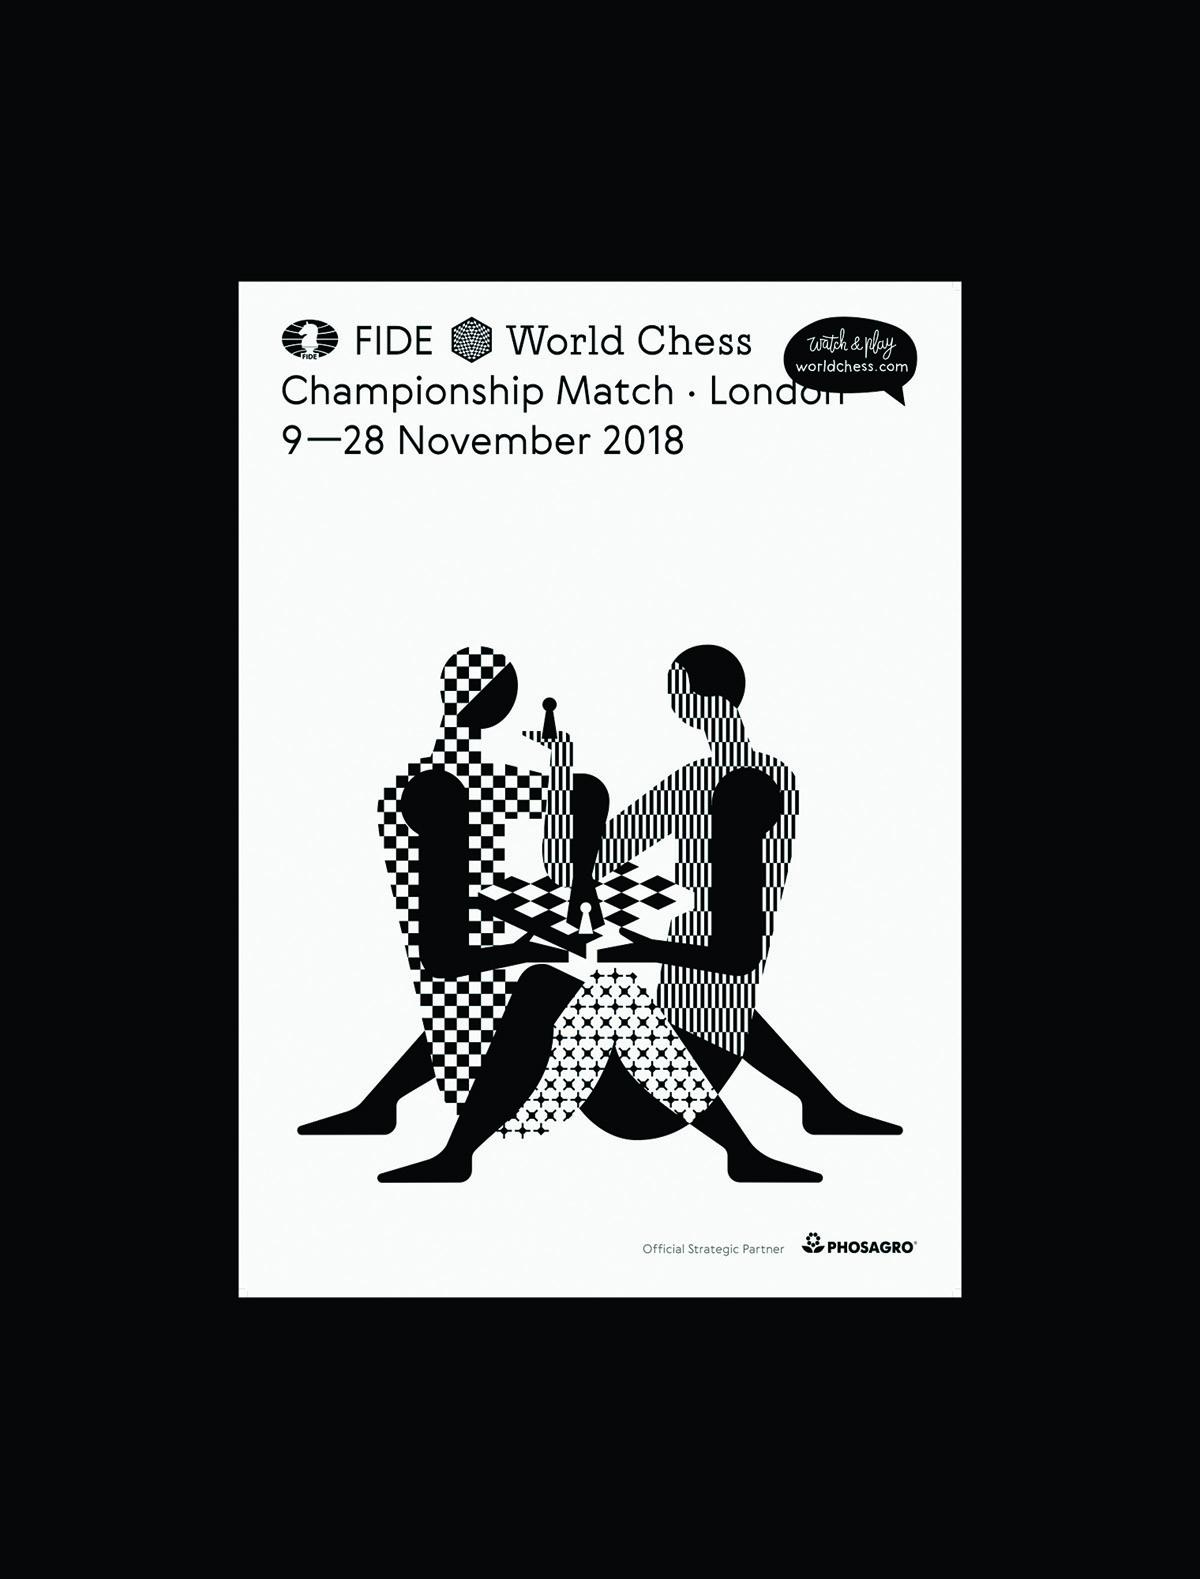 2018 World Chess Championship by Shuka - Creative Work - $i